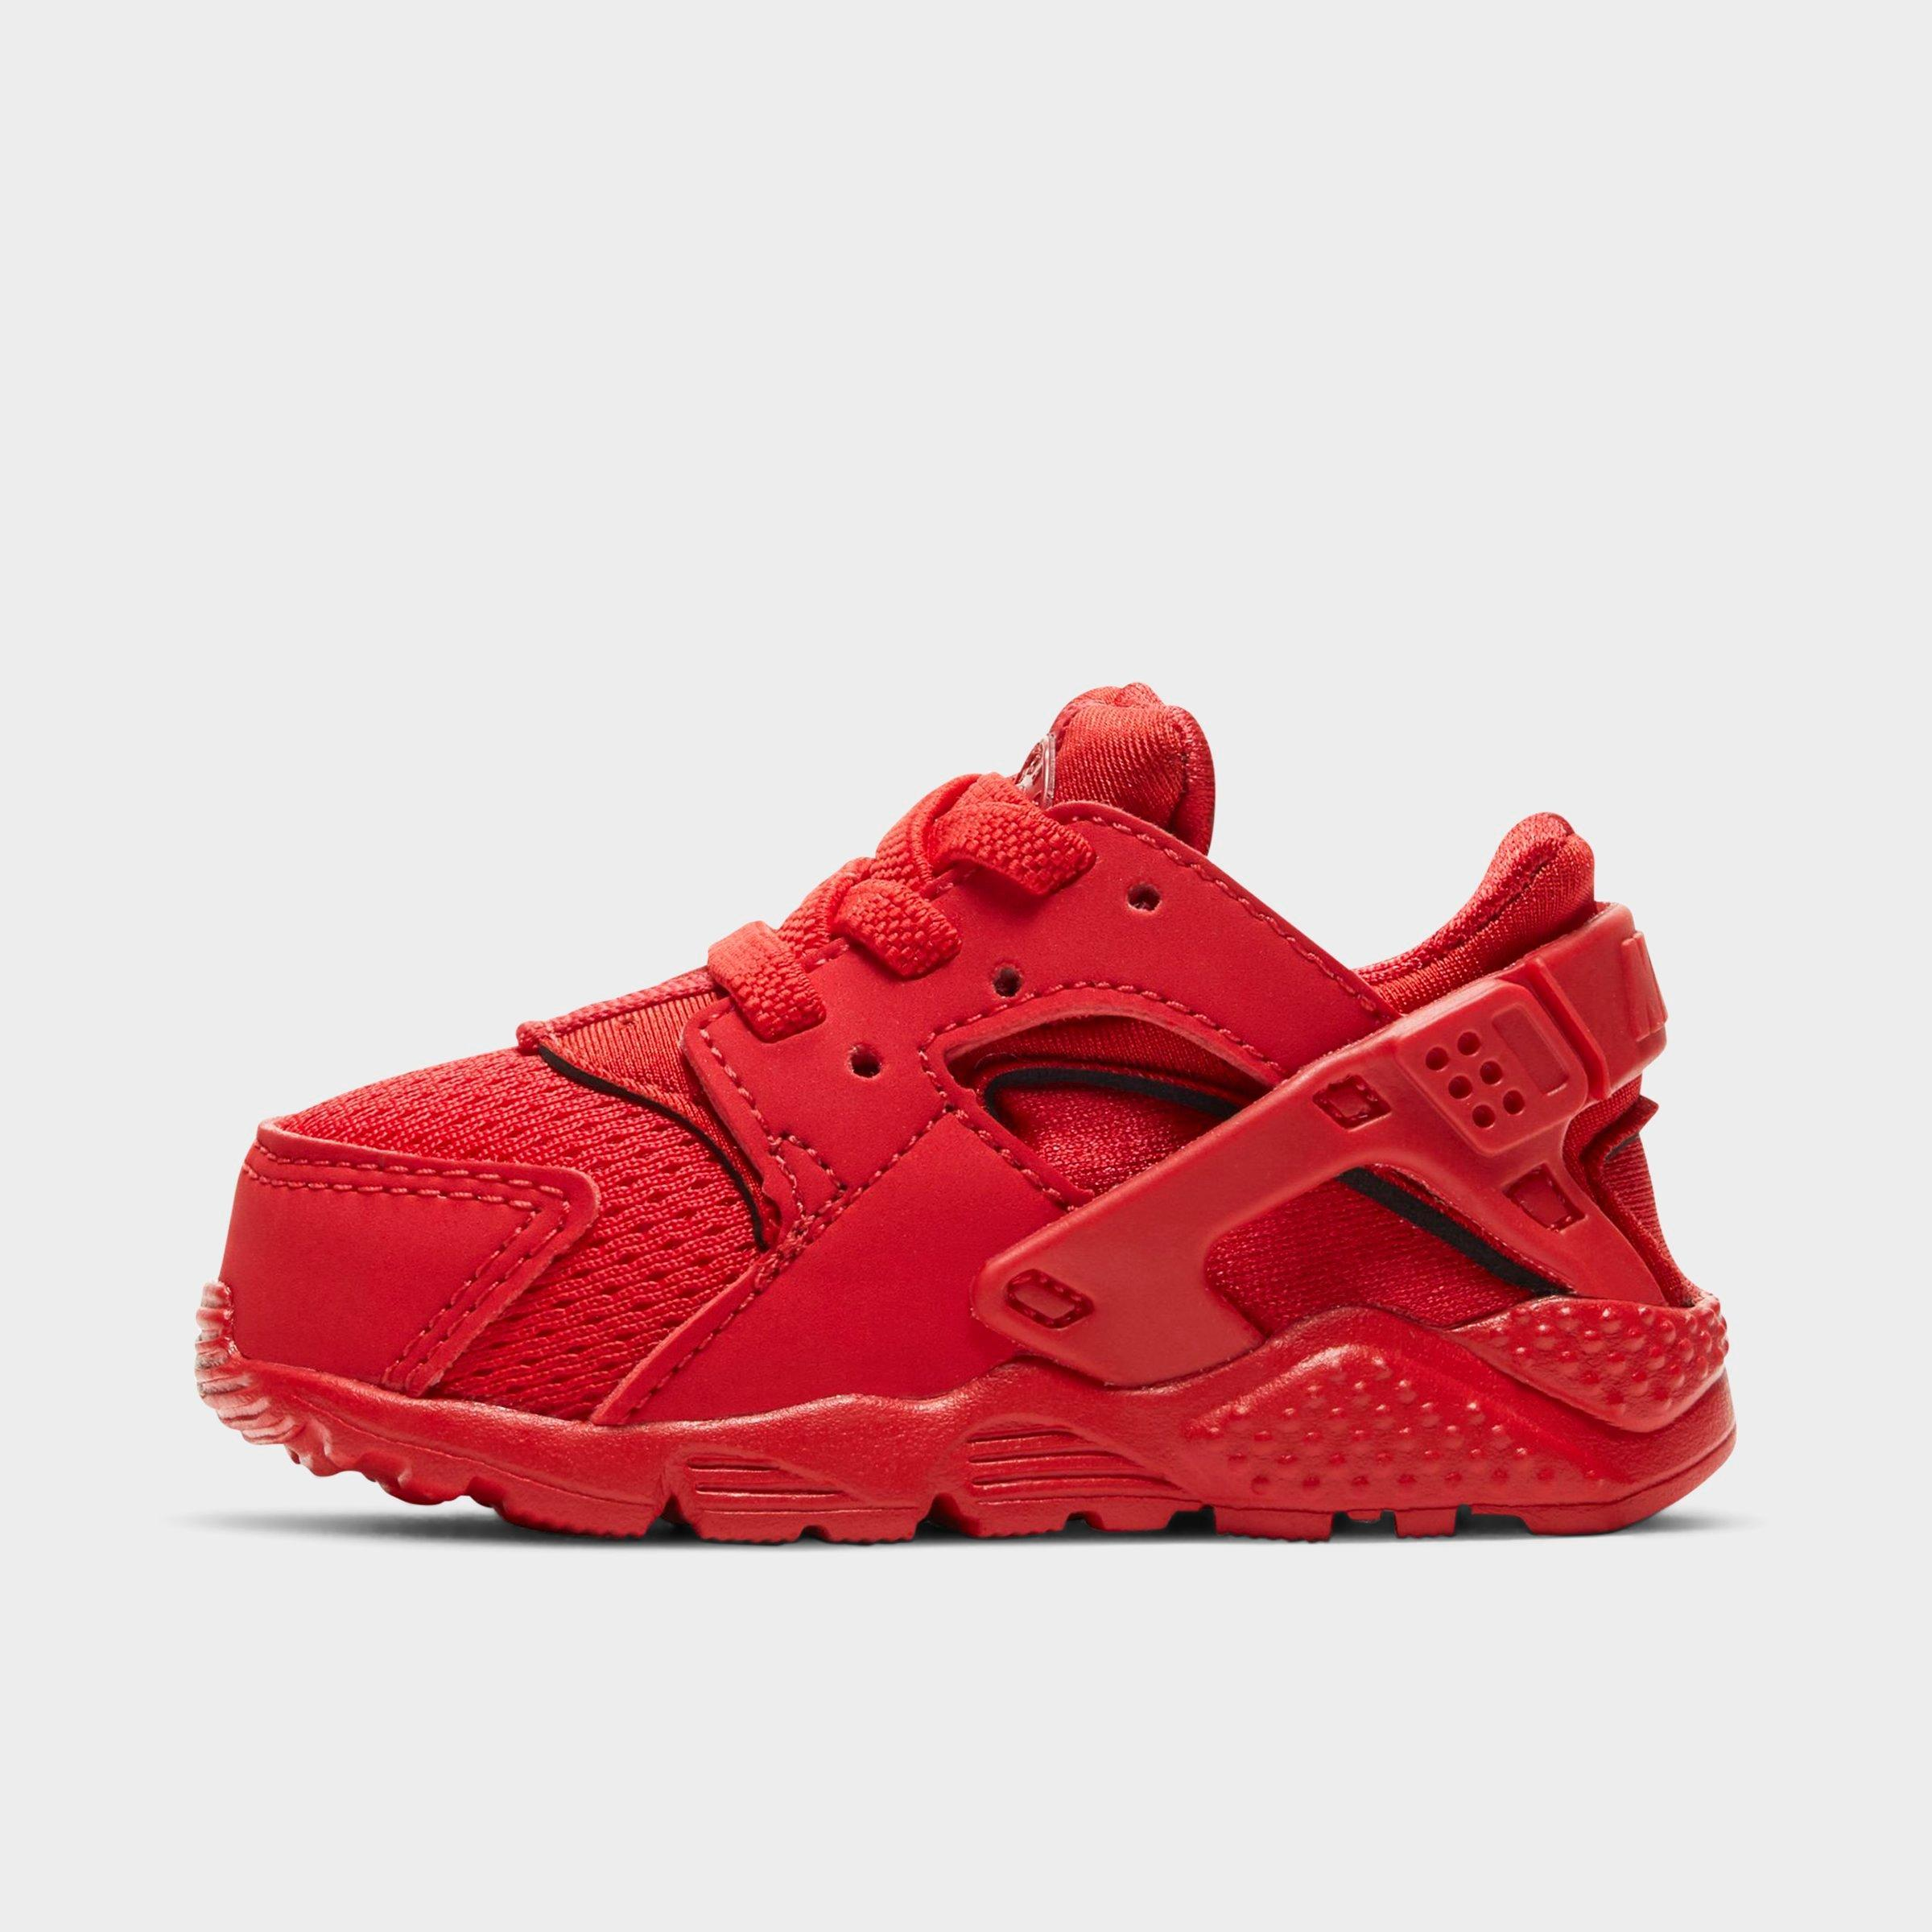 harachis shoes